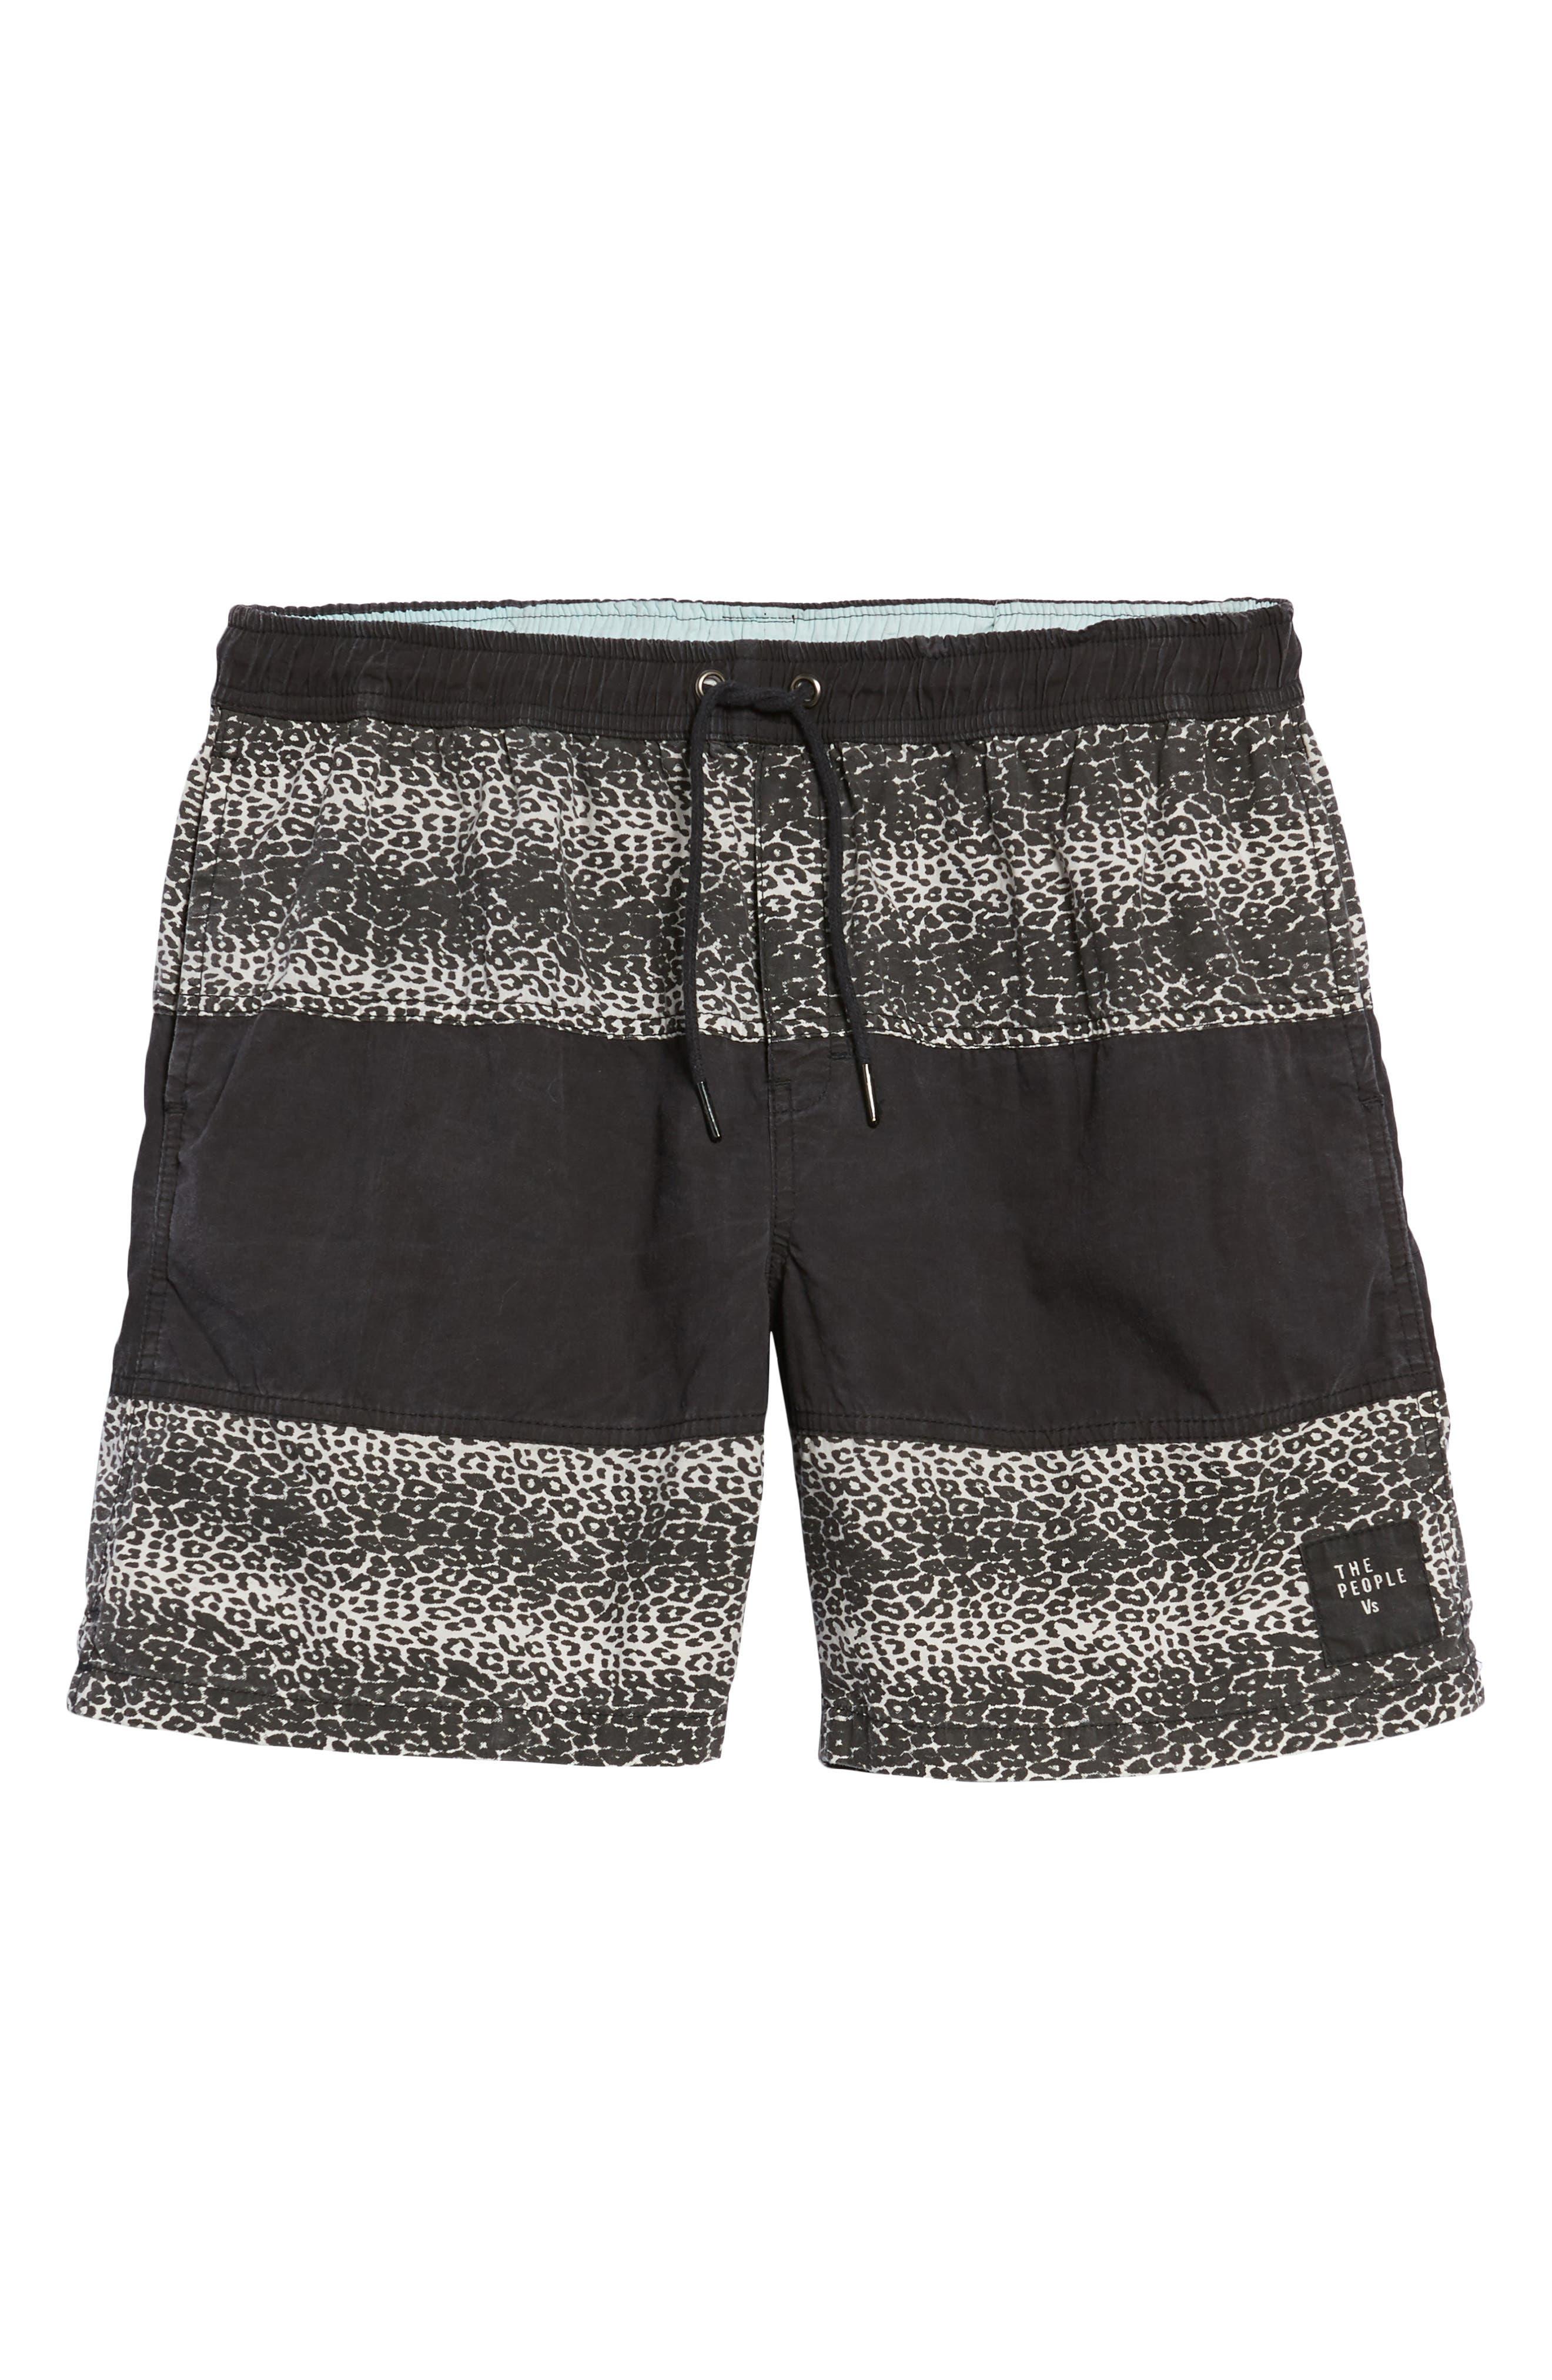 Easy Boardie Shorts,                             Alternate thumbnail 6, color,                             001